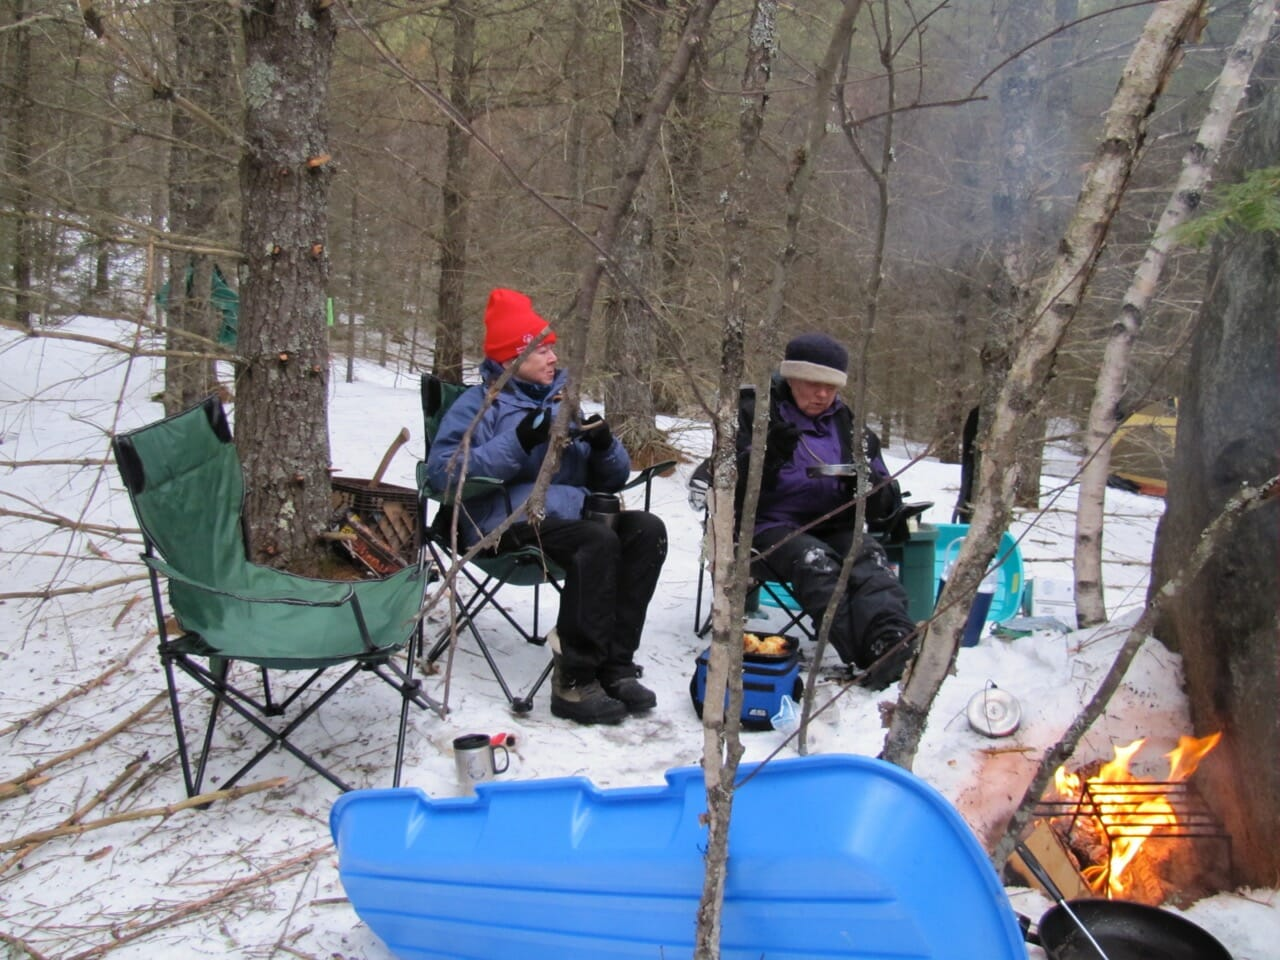 Winter Camping Always Be Prepared